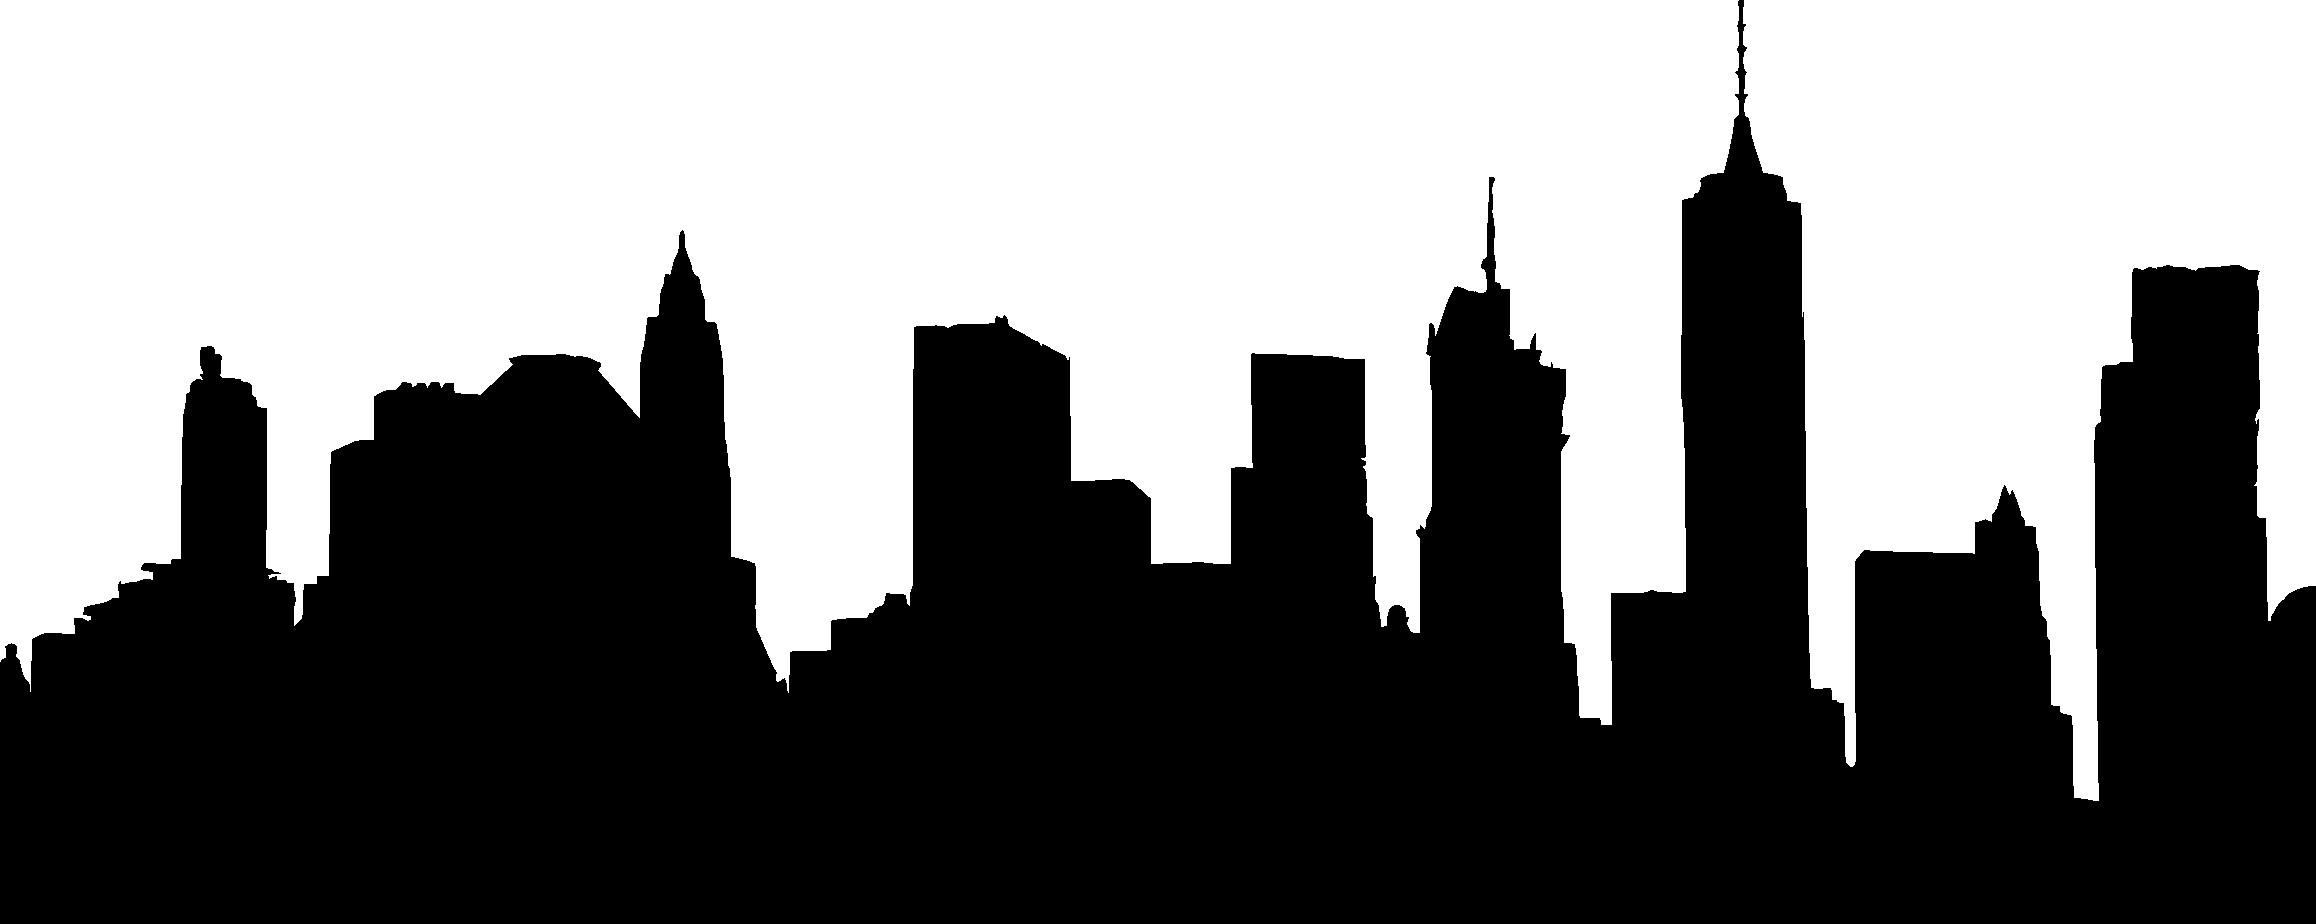 Boston Skyline Line Drawing.